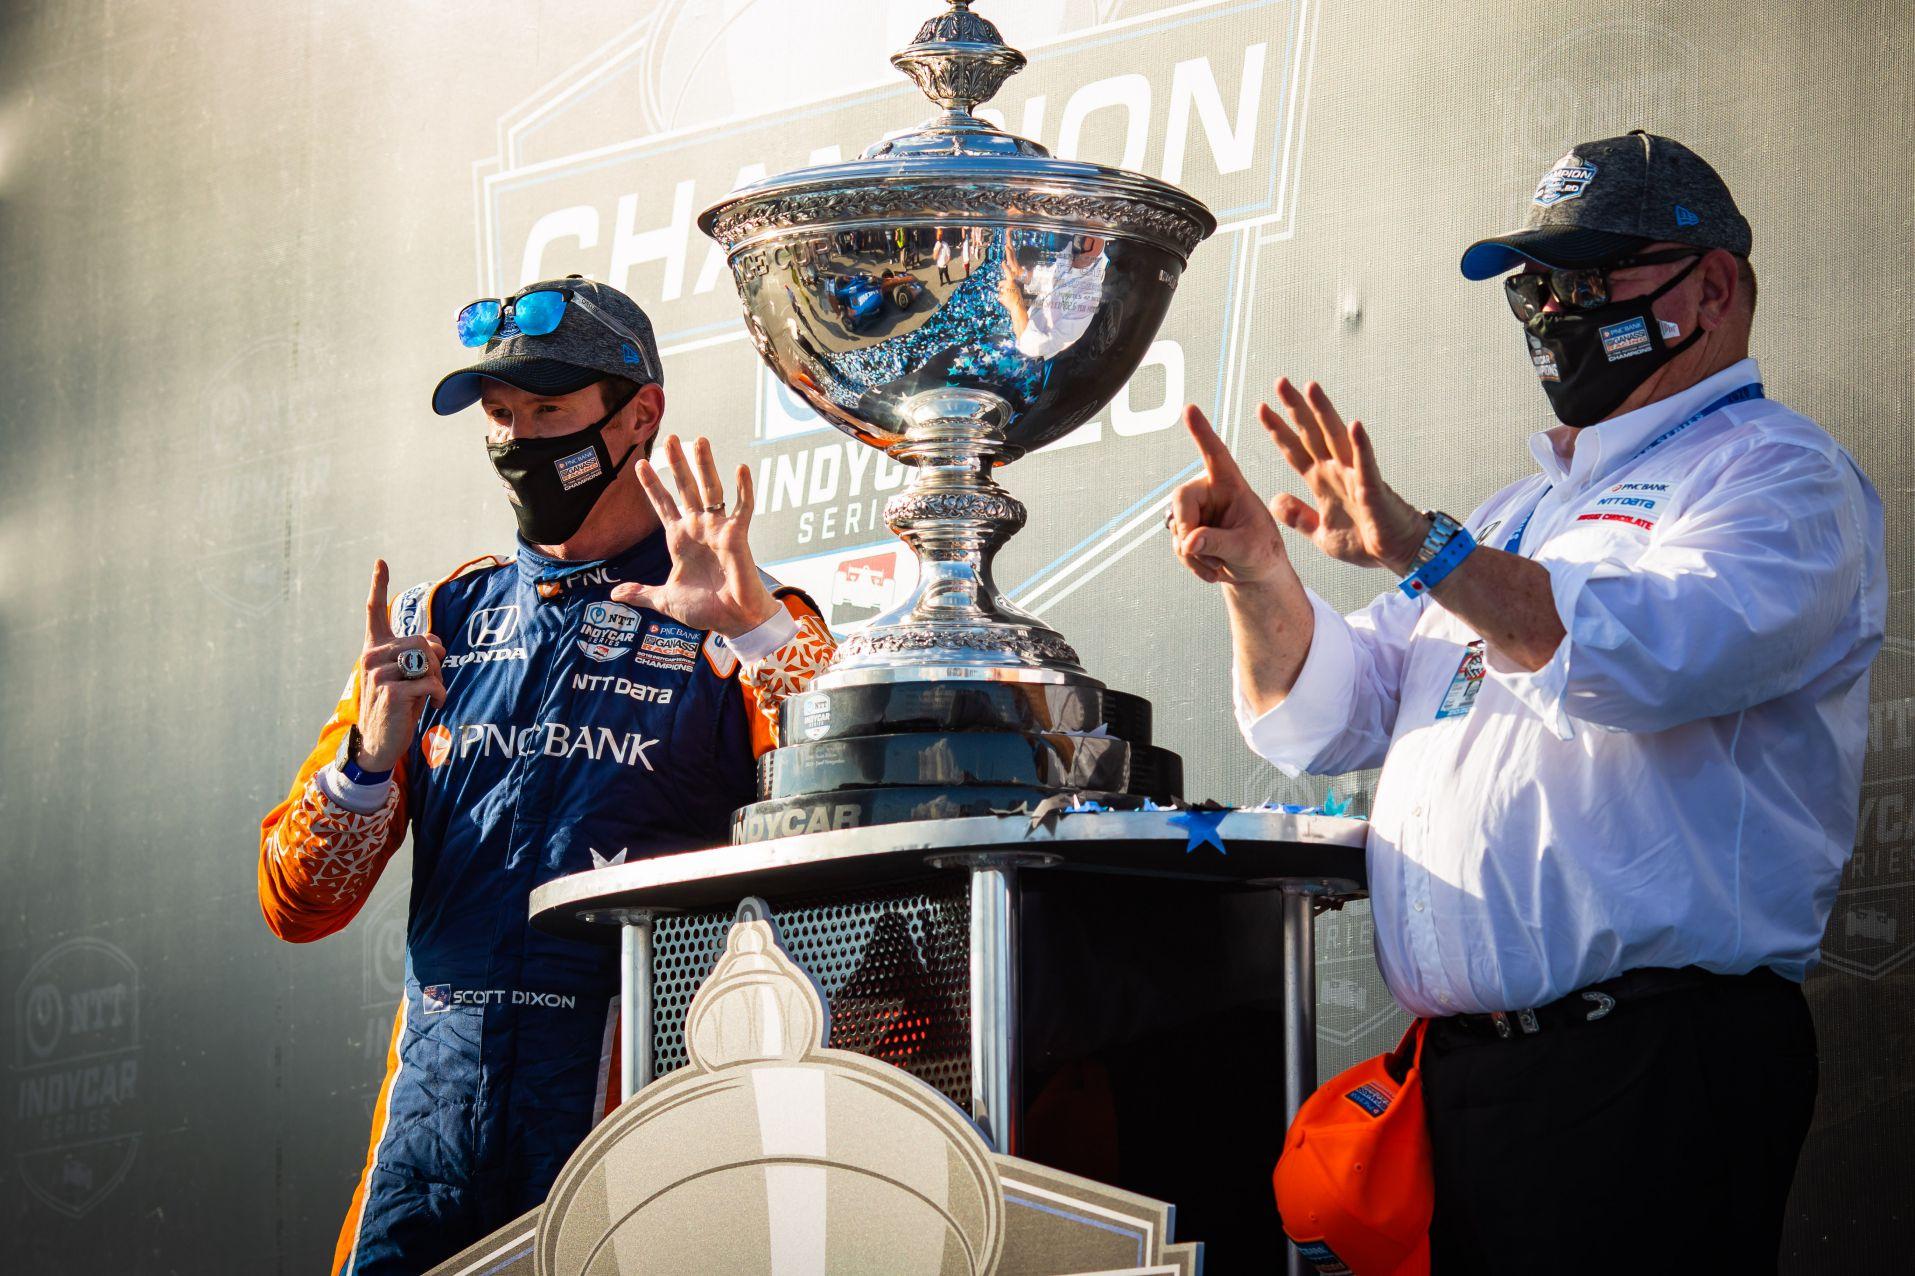 Scott Dixon and owner Chip Ganassi celebrate INDYCAR Series championship number six. © [Kenneth Midgett/ Spacesuit Media]